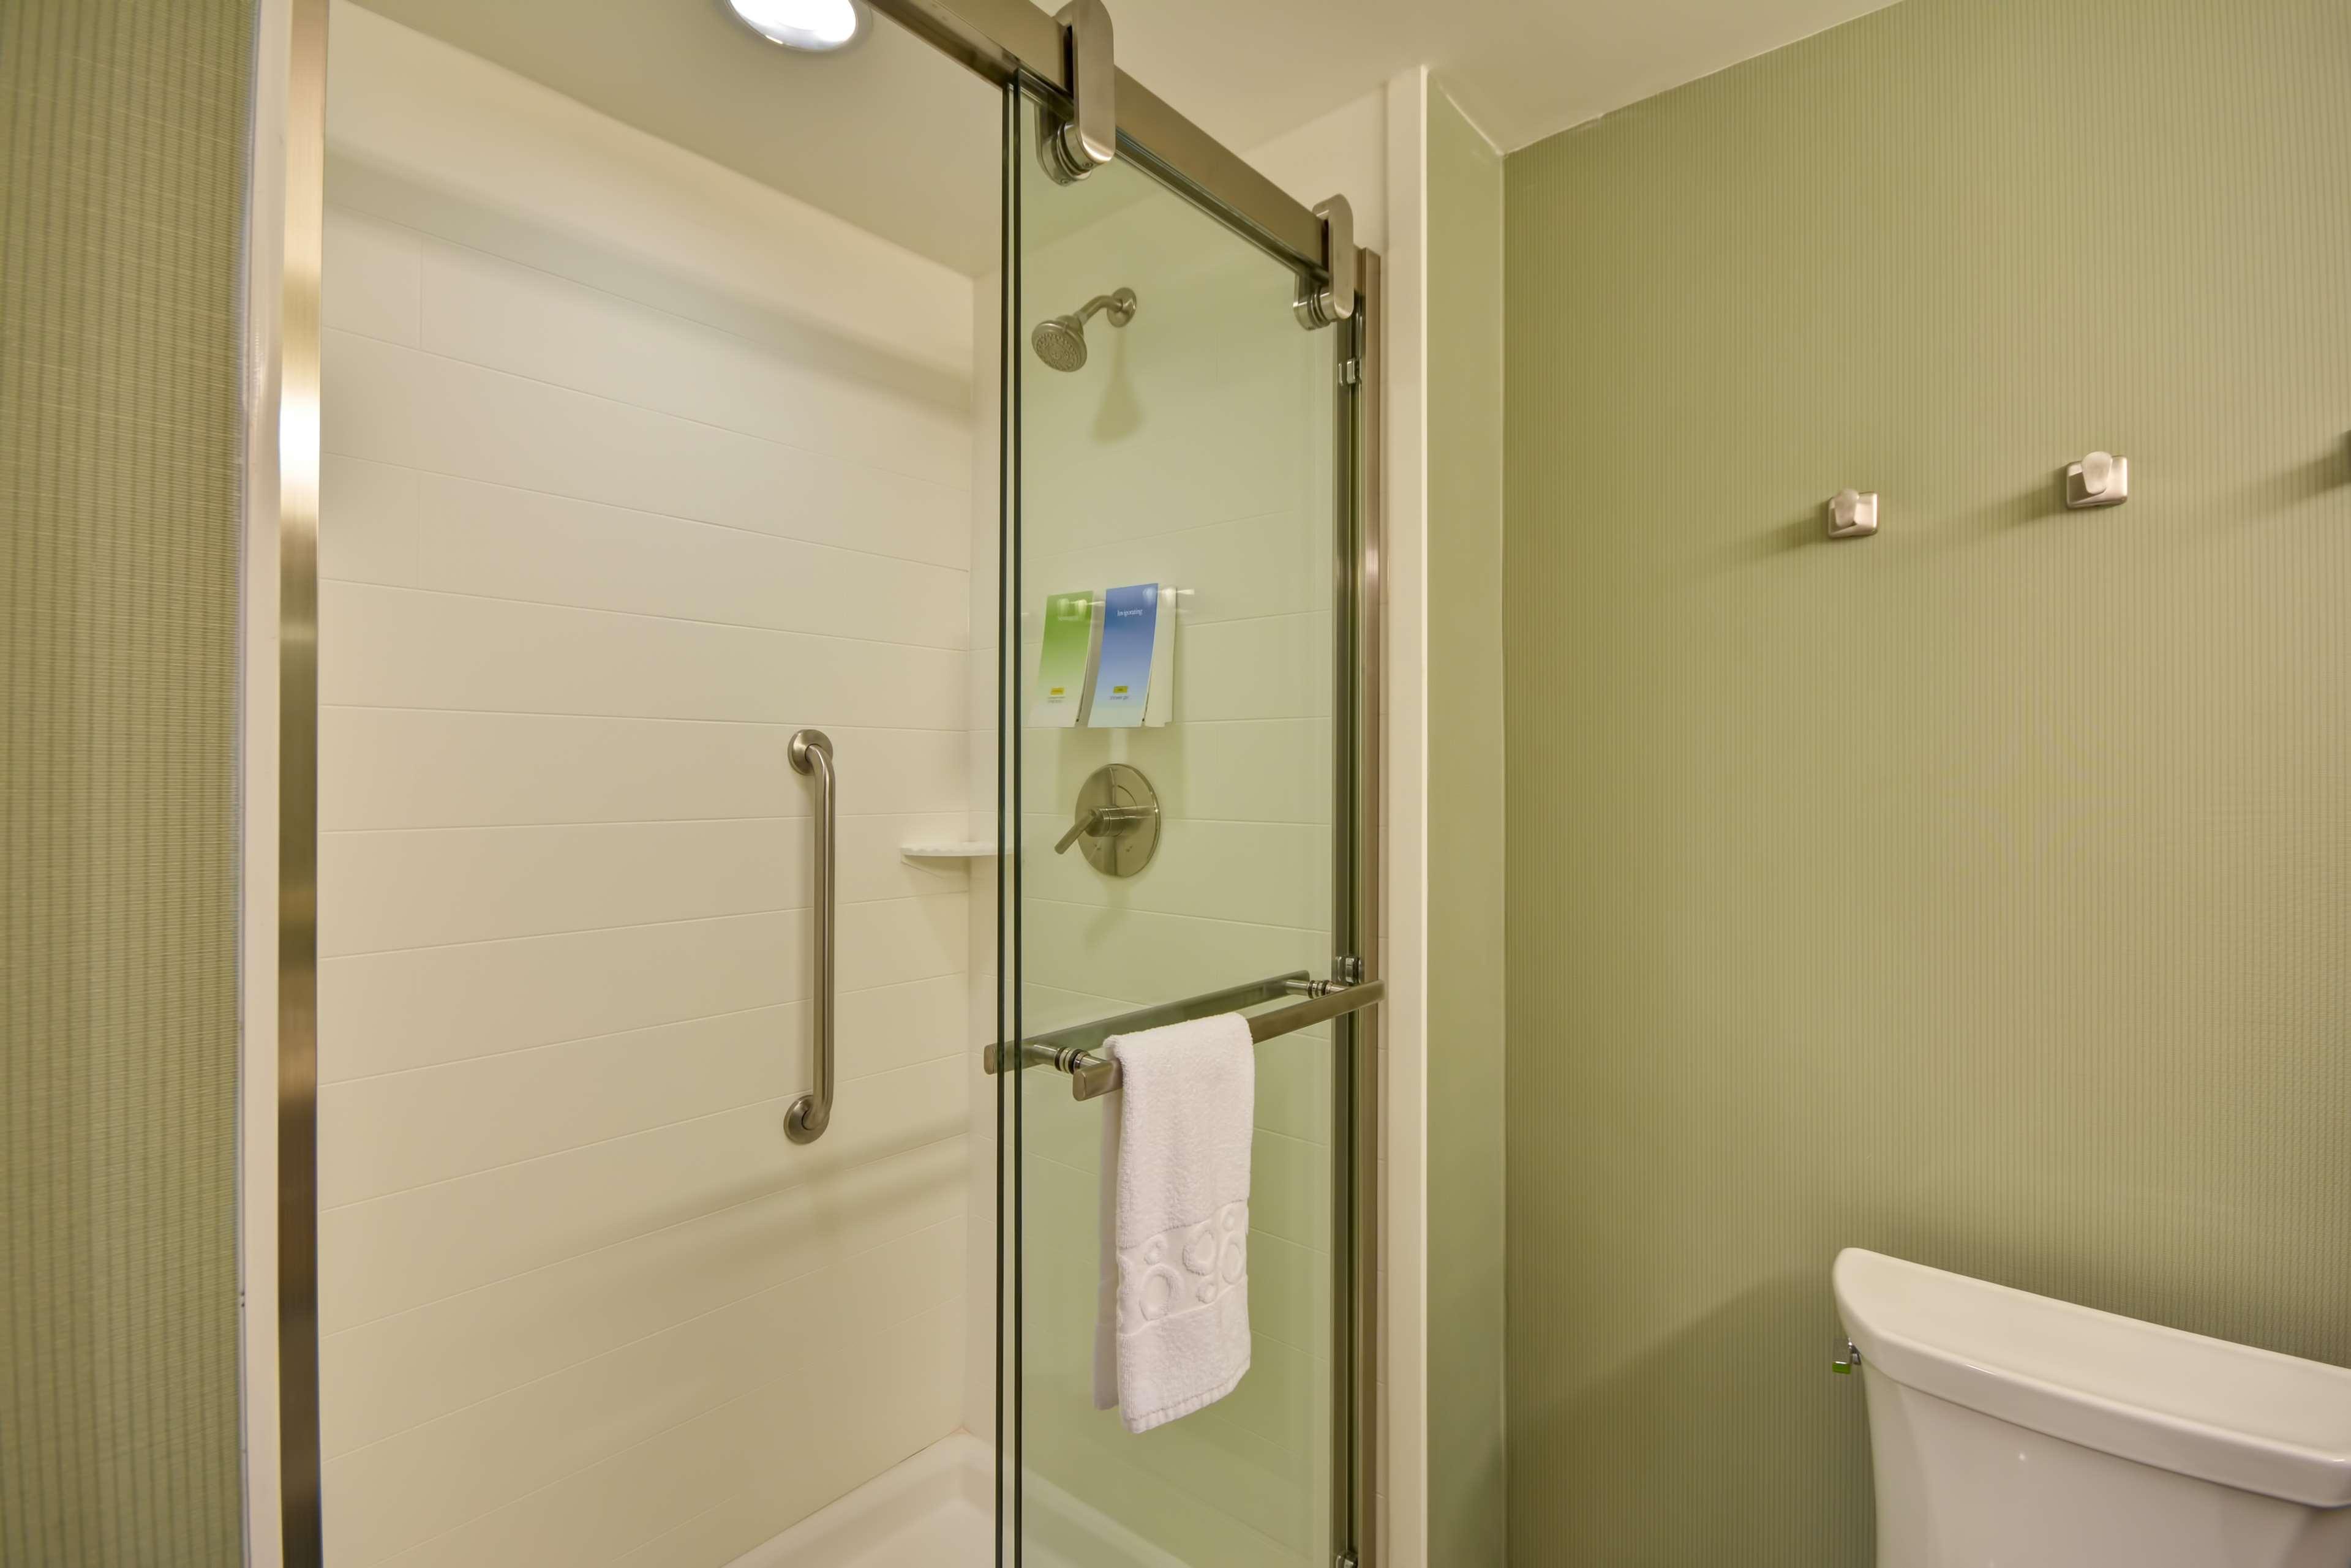 Home2 Suites by Hilton  St. Simons Island image 40